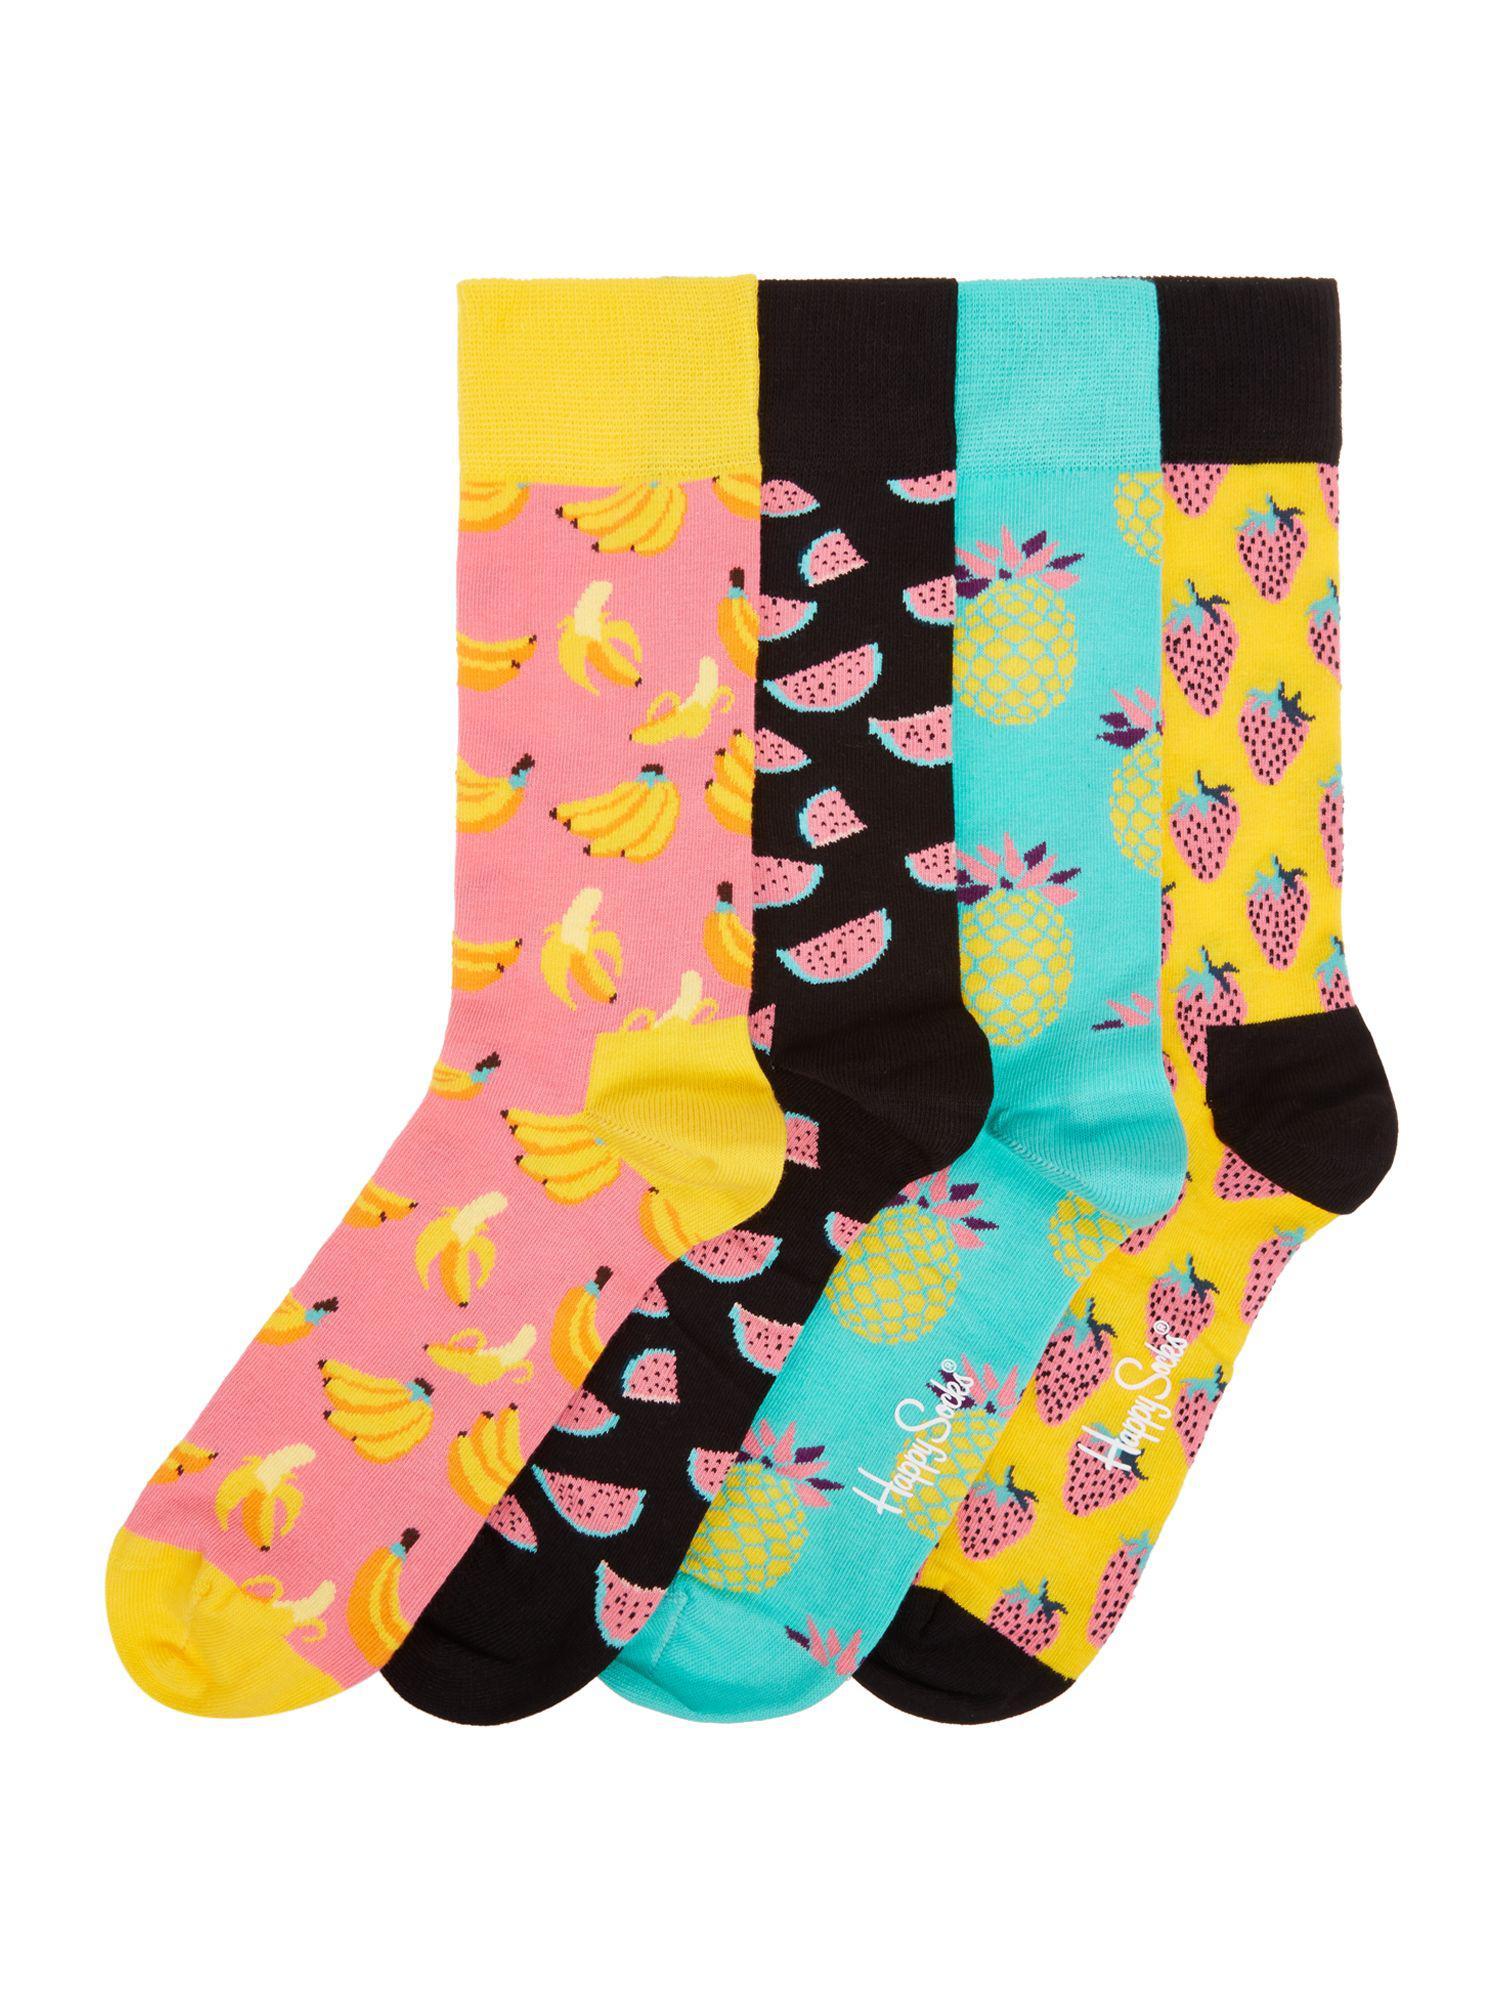 Happy Socks® 4-Pack Fruit Socks Gift Box Cheap Affordable Ebay Sale Online 4p2P3F